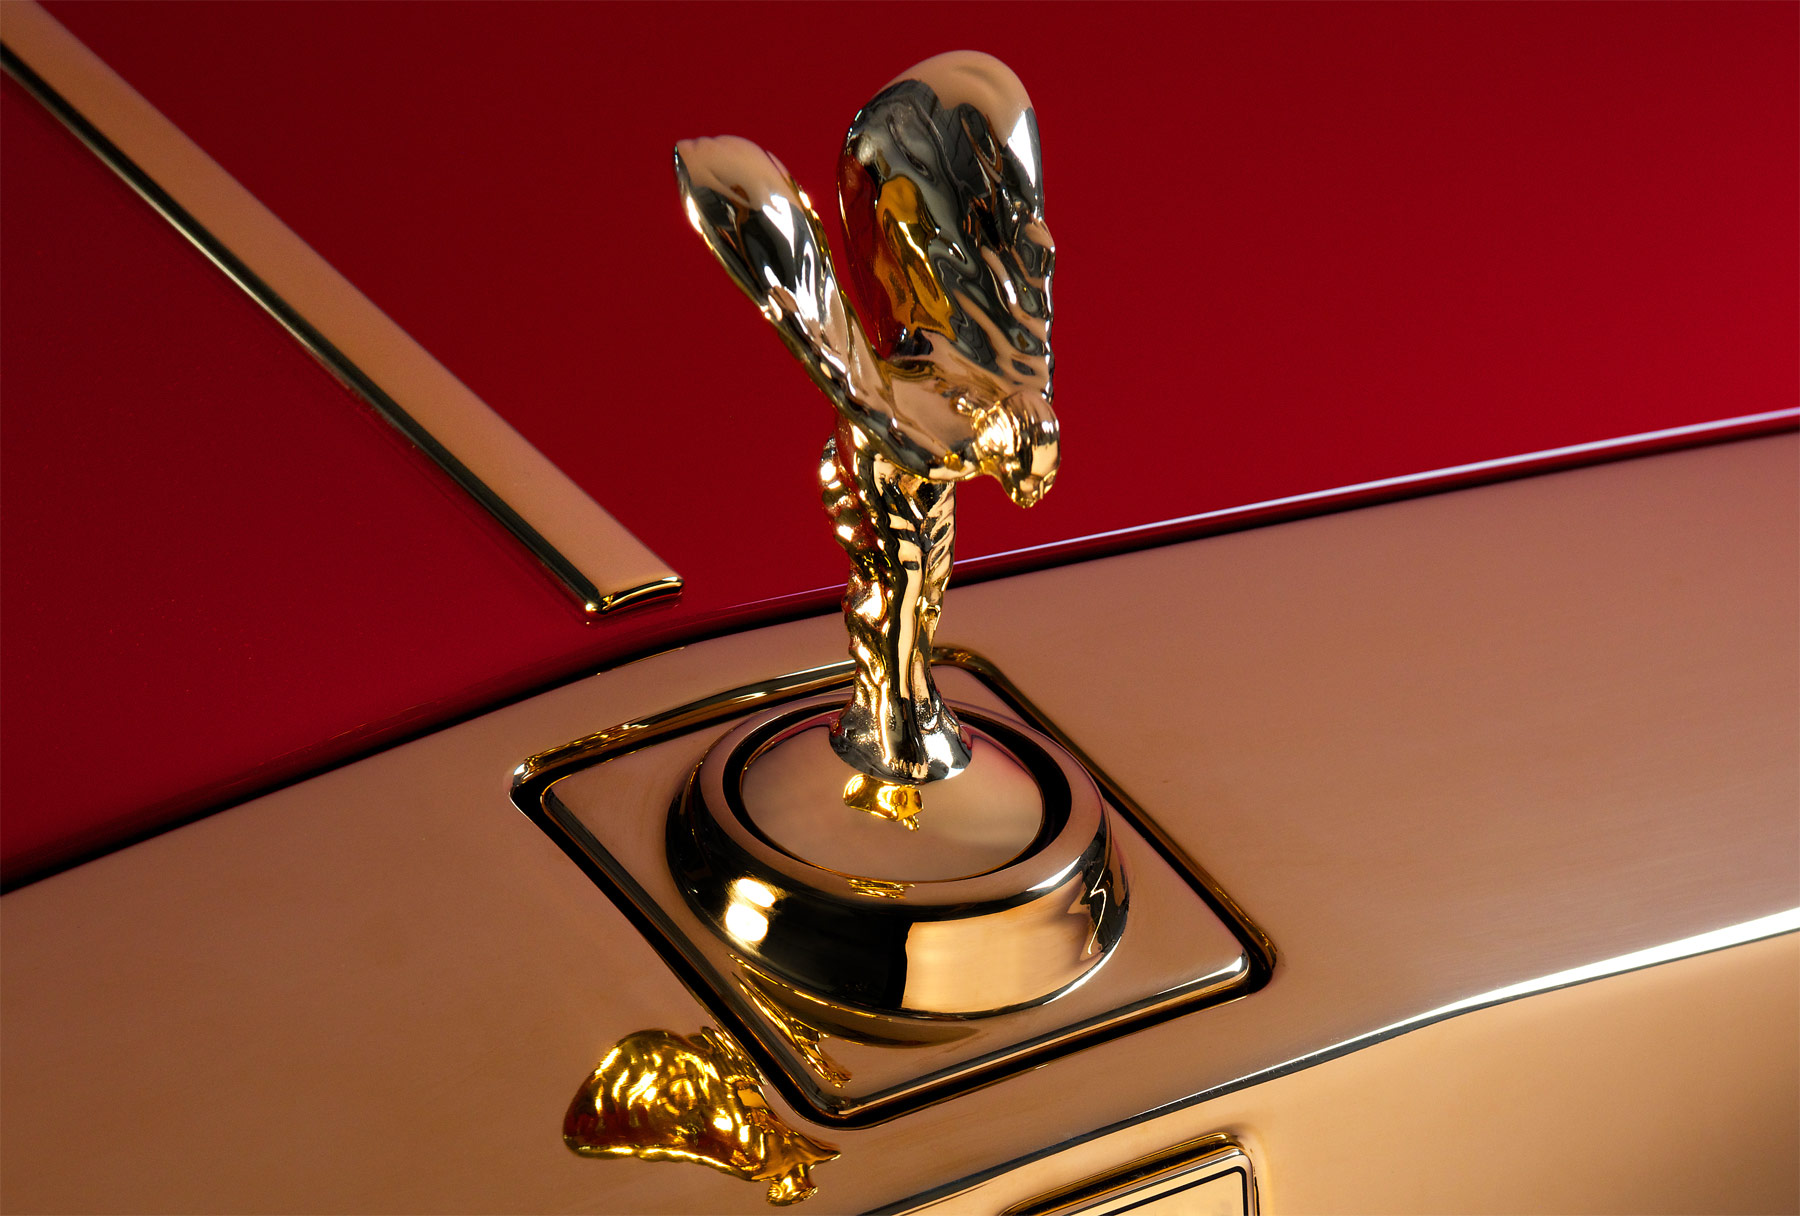 24 carat gold-plated Spirit of Ecstasy